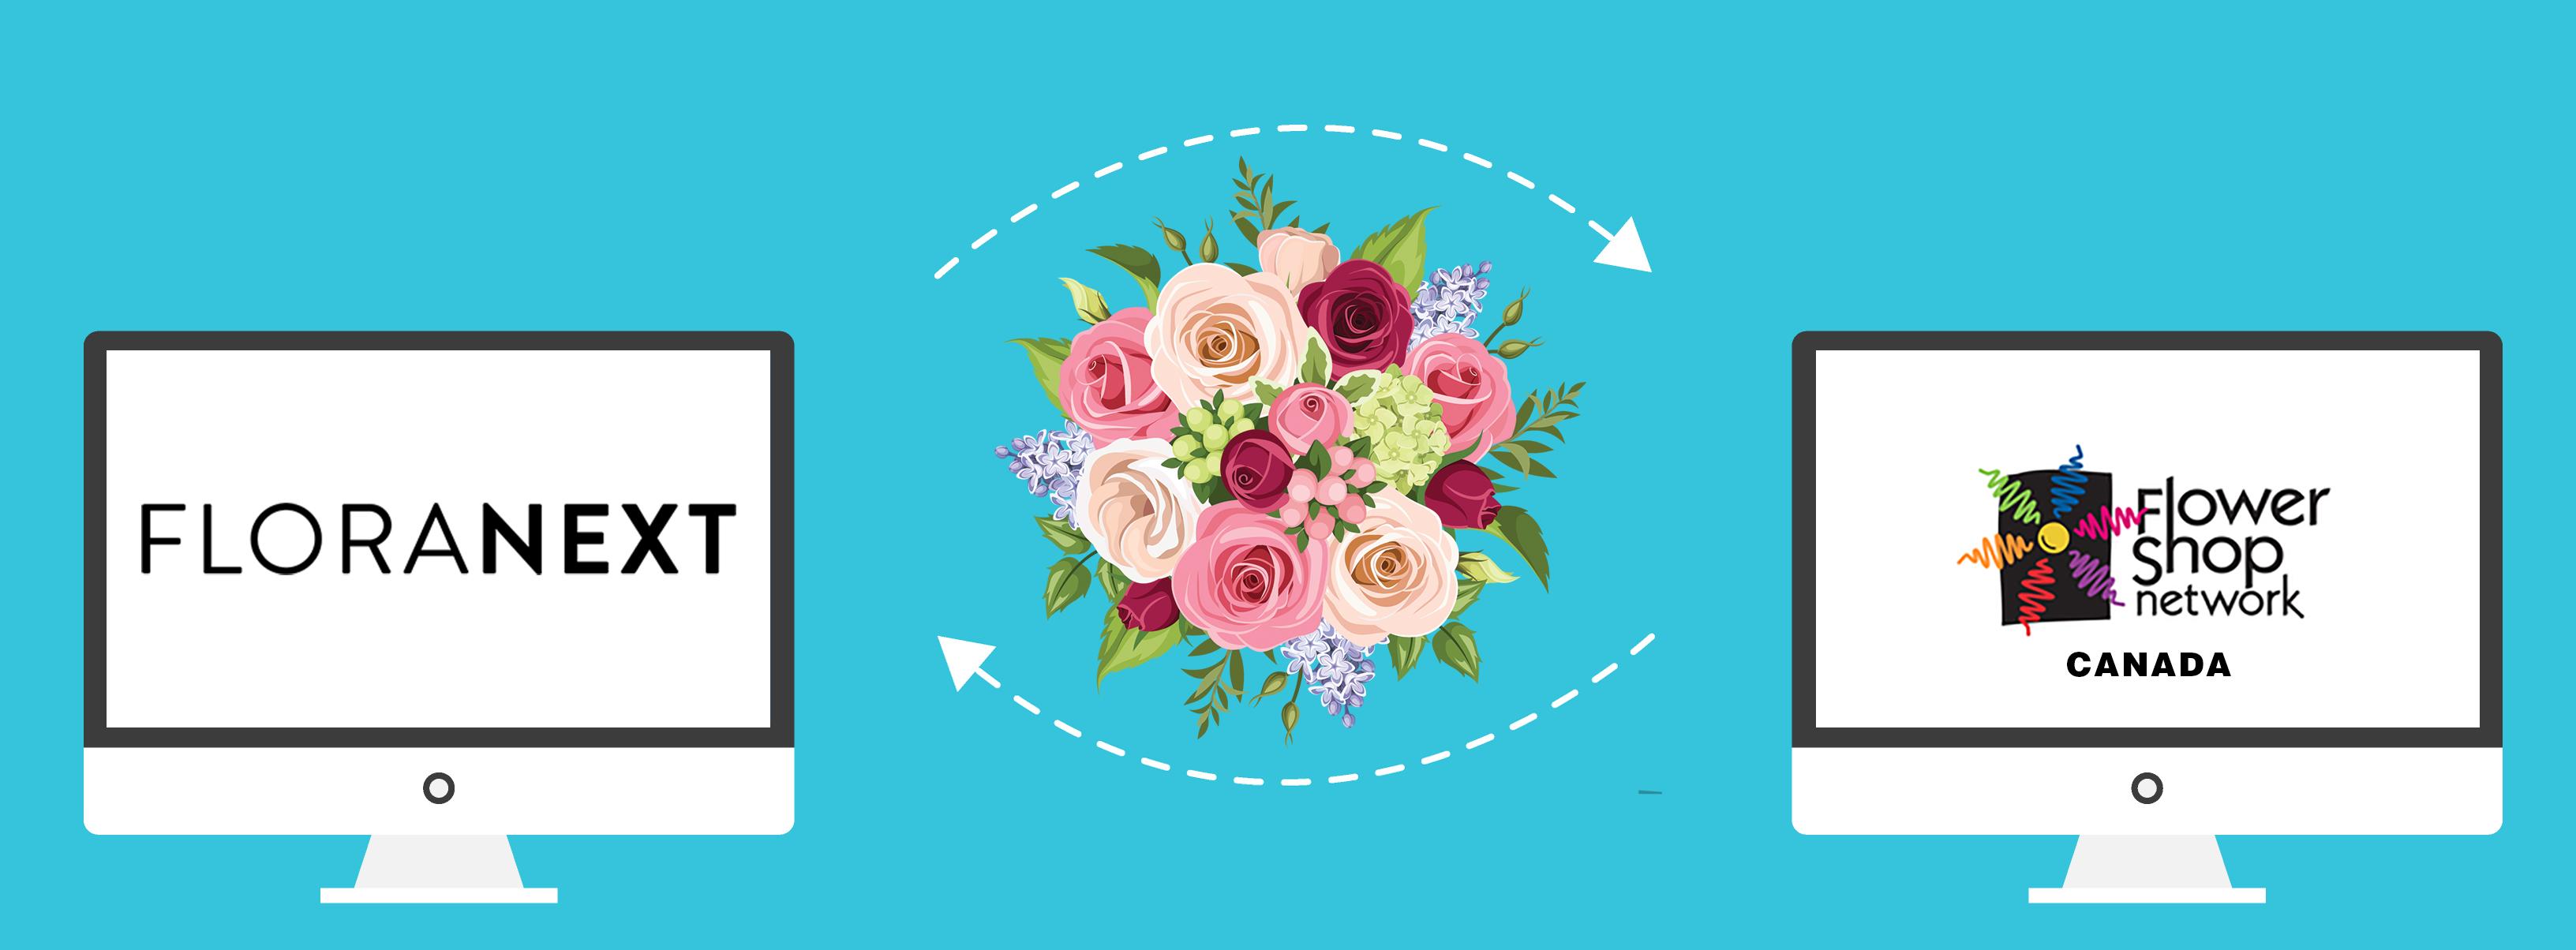 FSN-Canada-Floranext